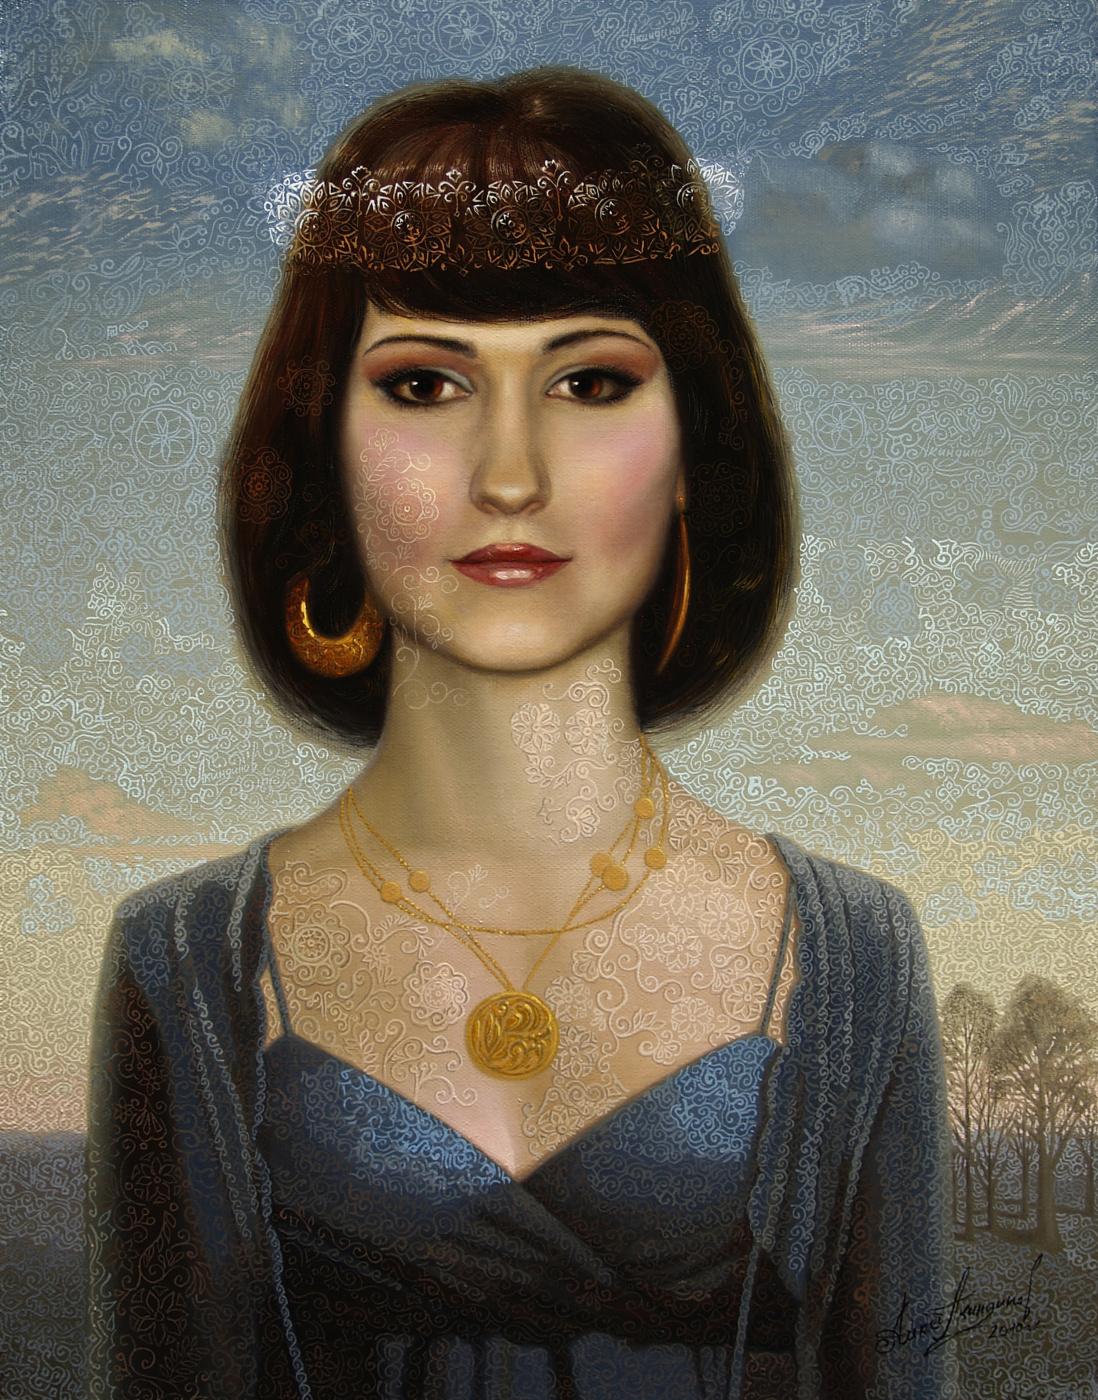 Алексей Петрович Акиндинов. Daughter of the morning light. Portrait of Anastasia Kolskaya